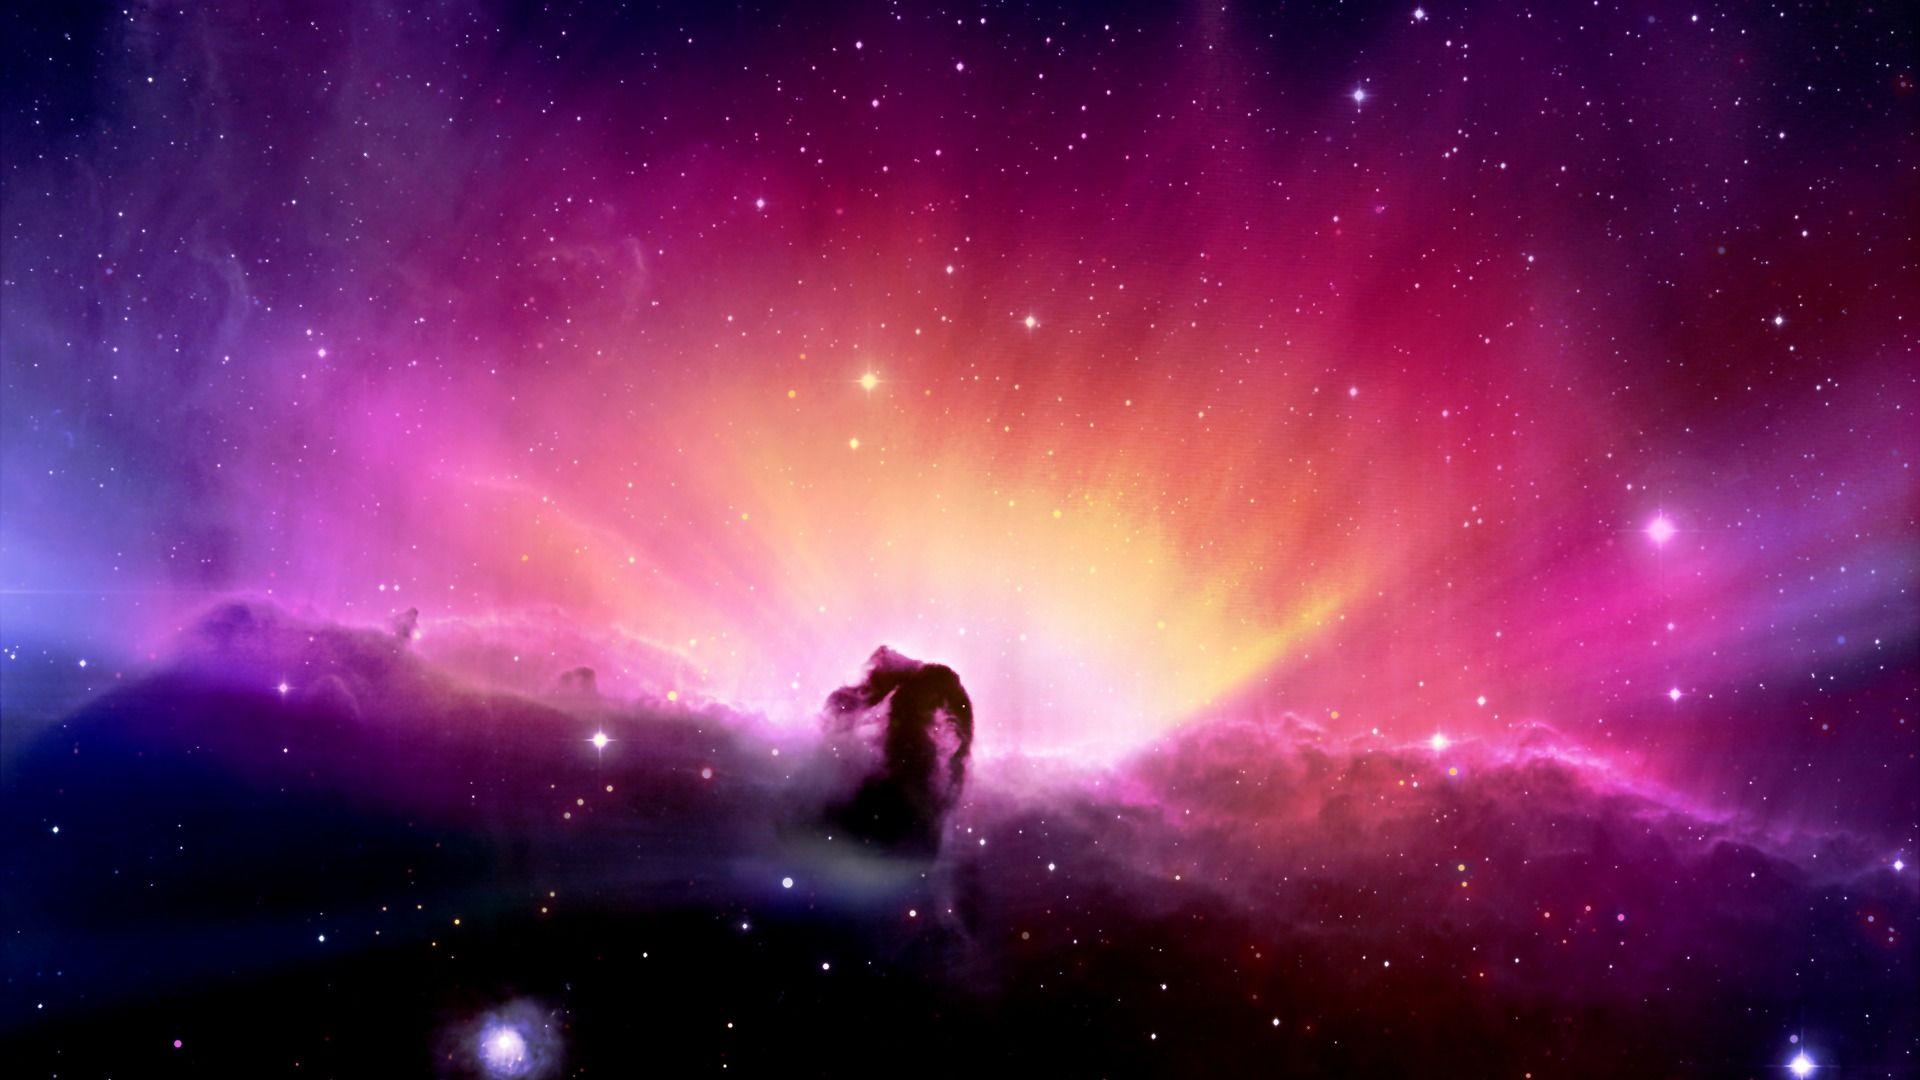 Hd wallpaper universe - Universe Universe Hd Wallpapers